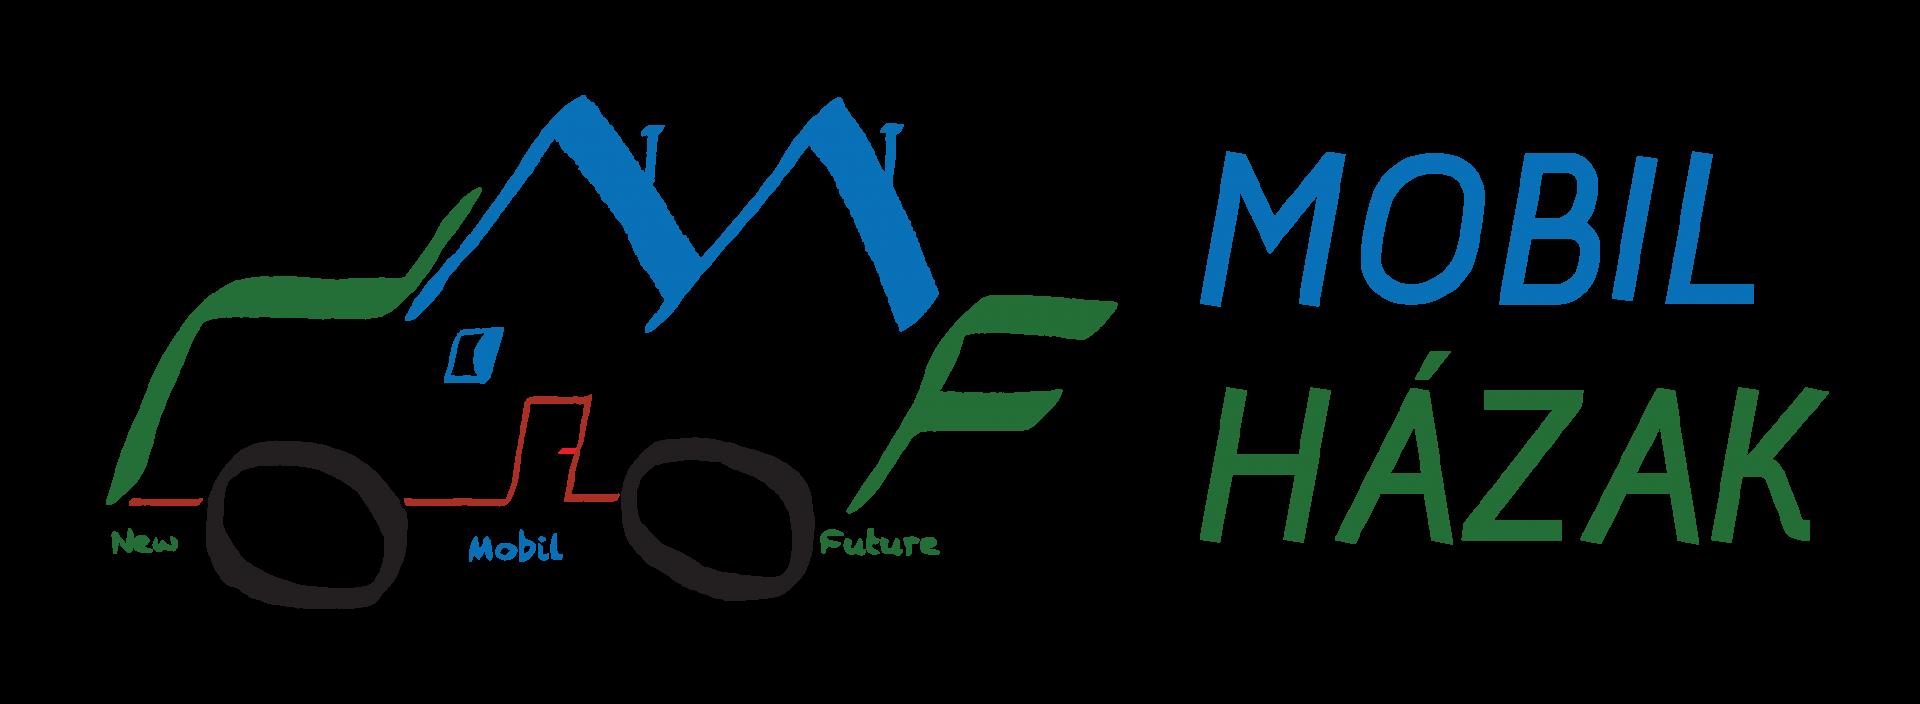 Mobilházak - Header logo image